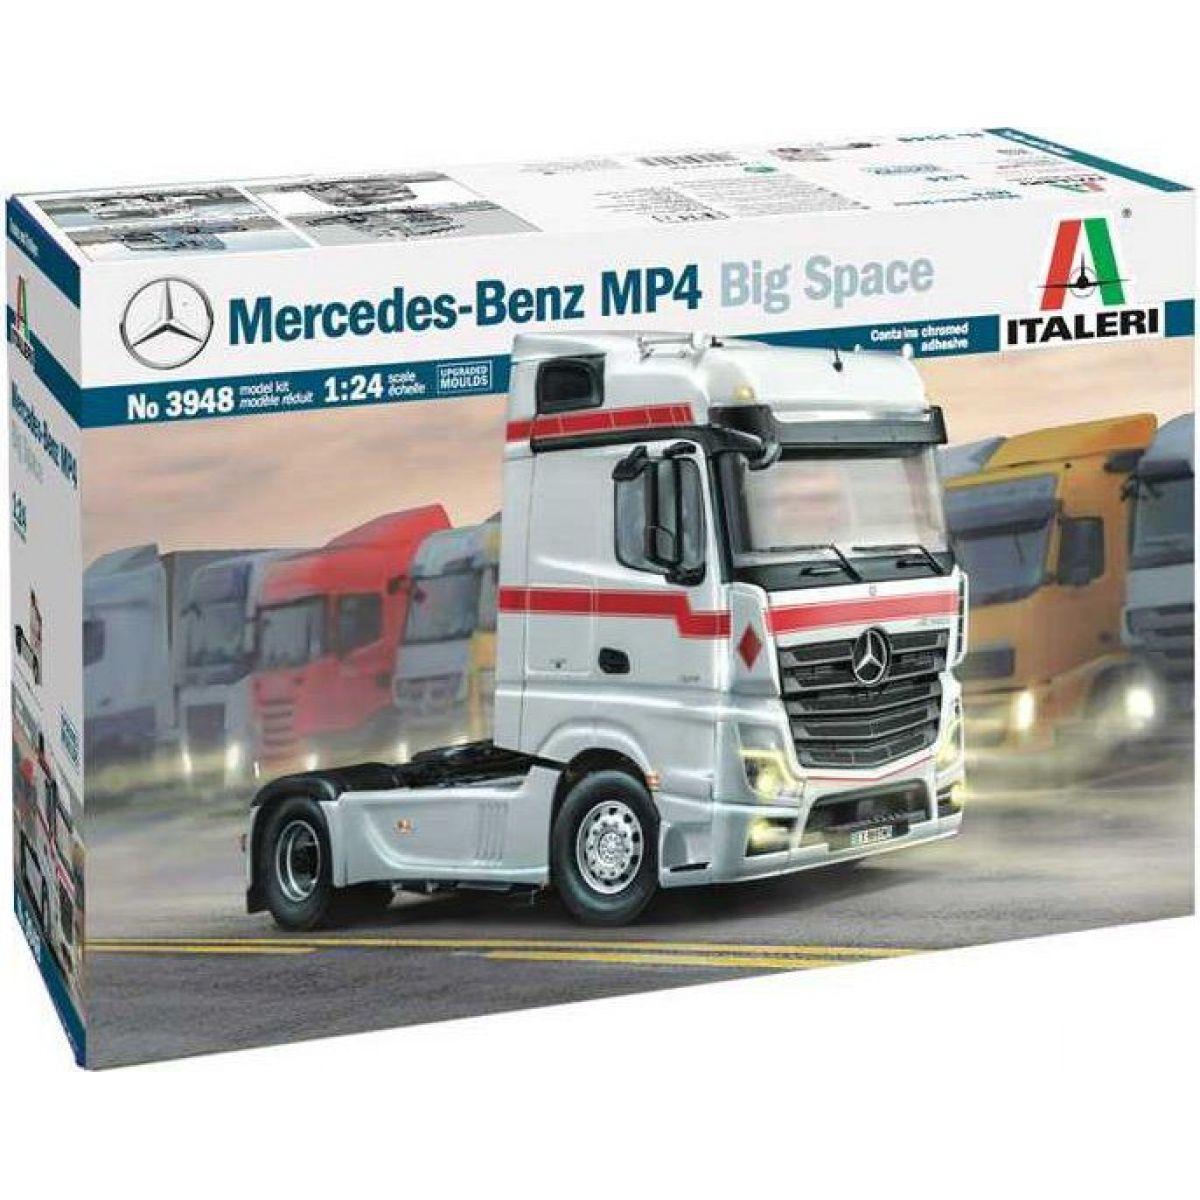 Italeri Model Kit truck 3948 Mercedes-Benz MP4 Big Space 1:24